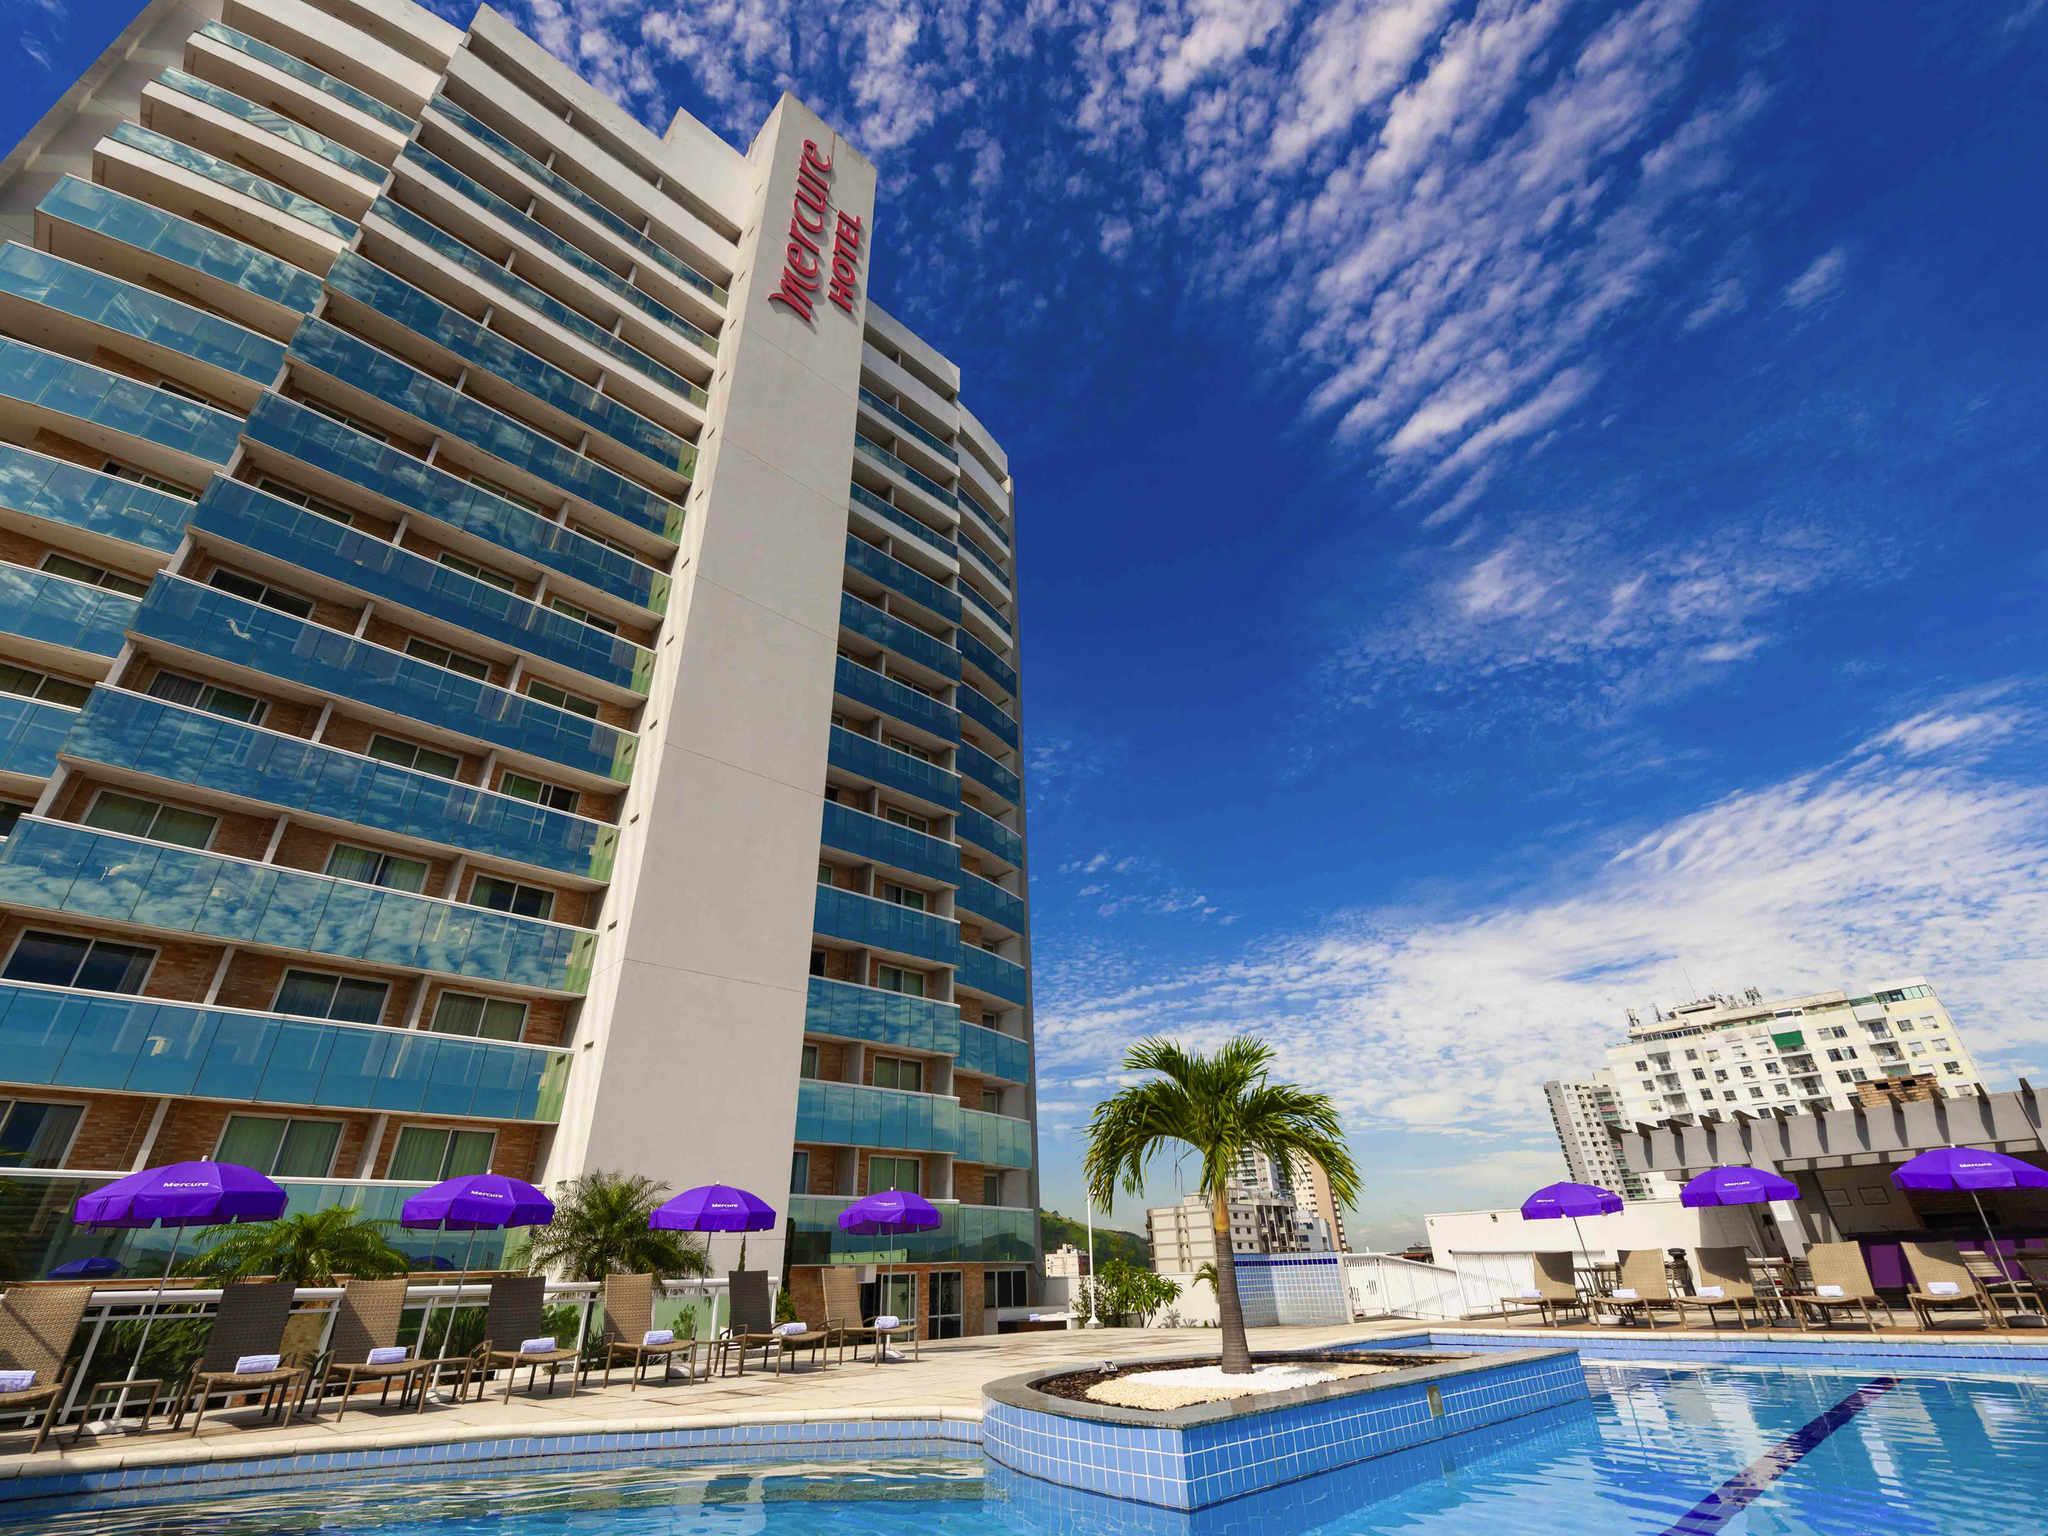 Hotel – Mercure Rio de Janeiro Nova Iguacu Hotel